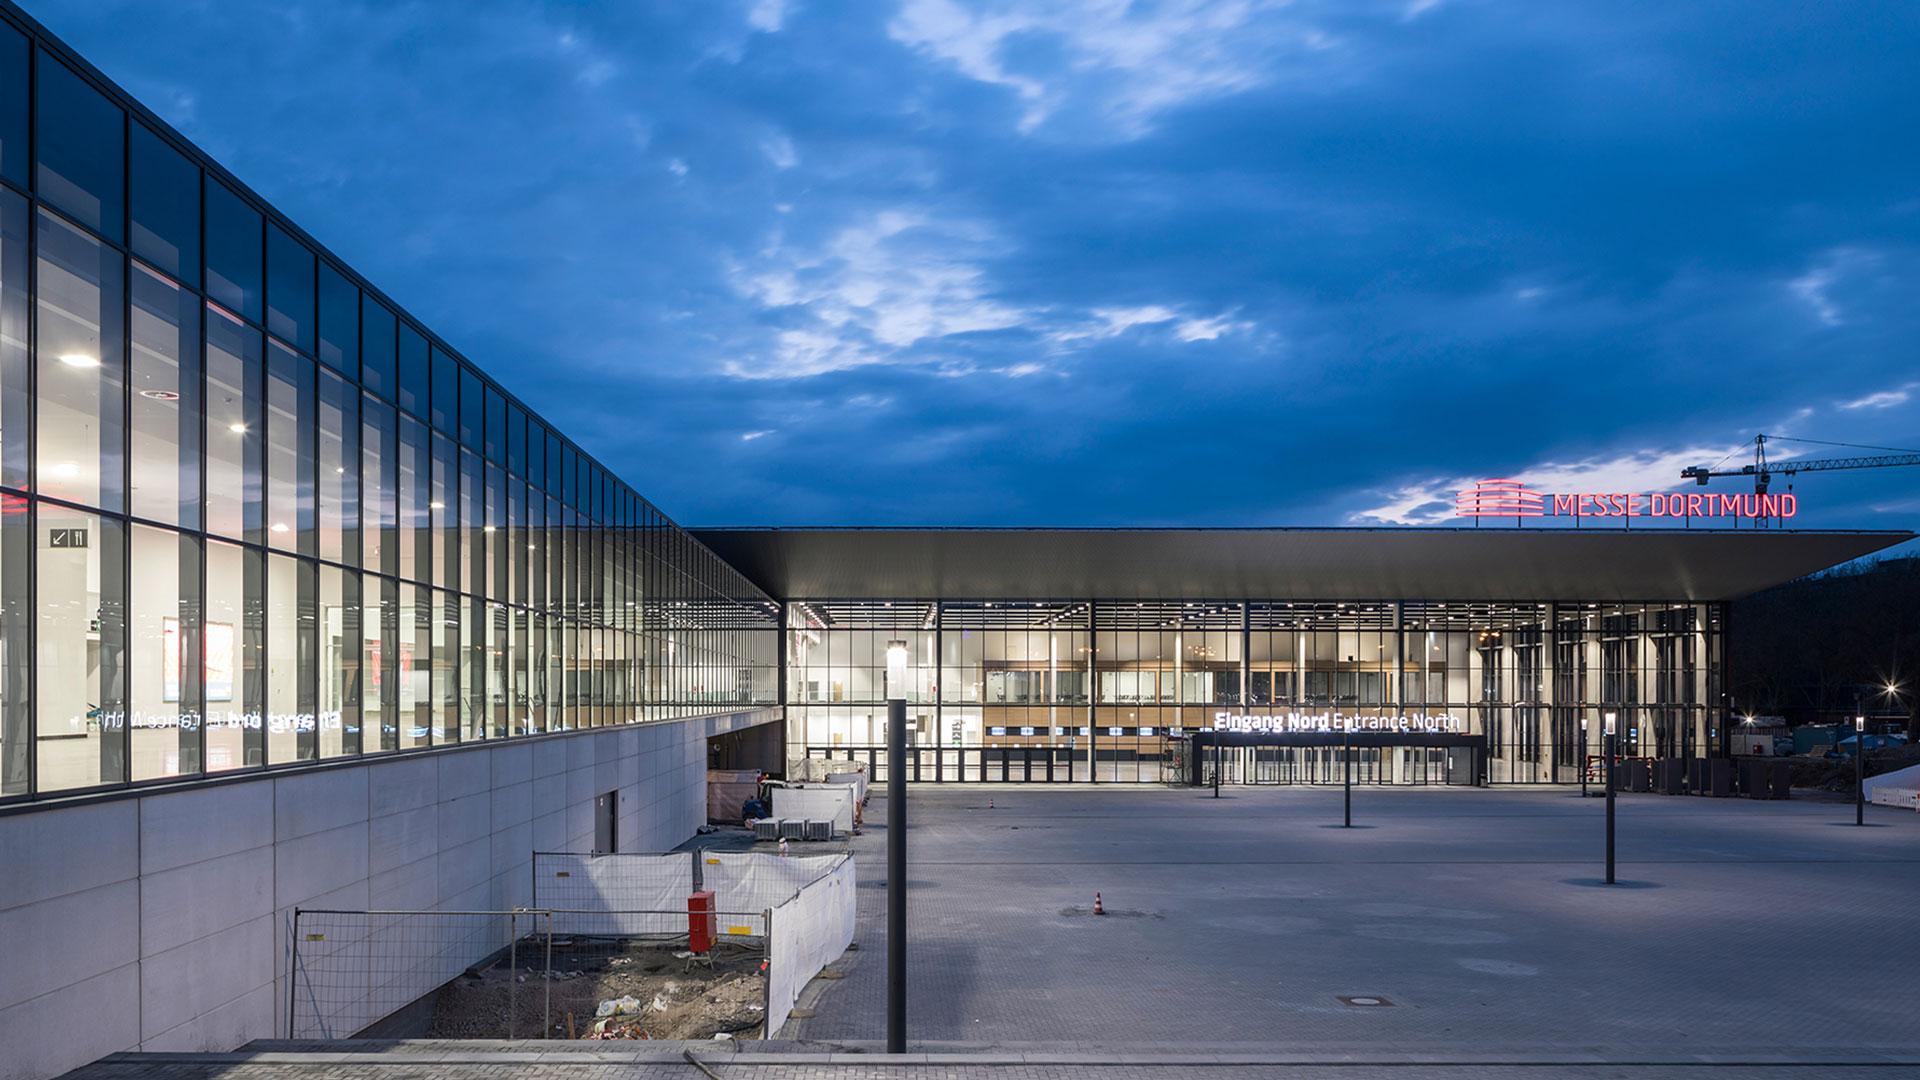 04_Westfalenhalle_Messe_Dortmund